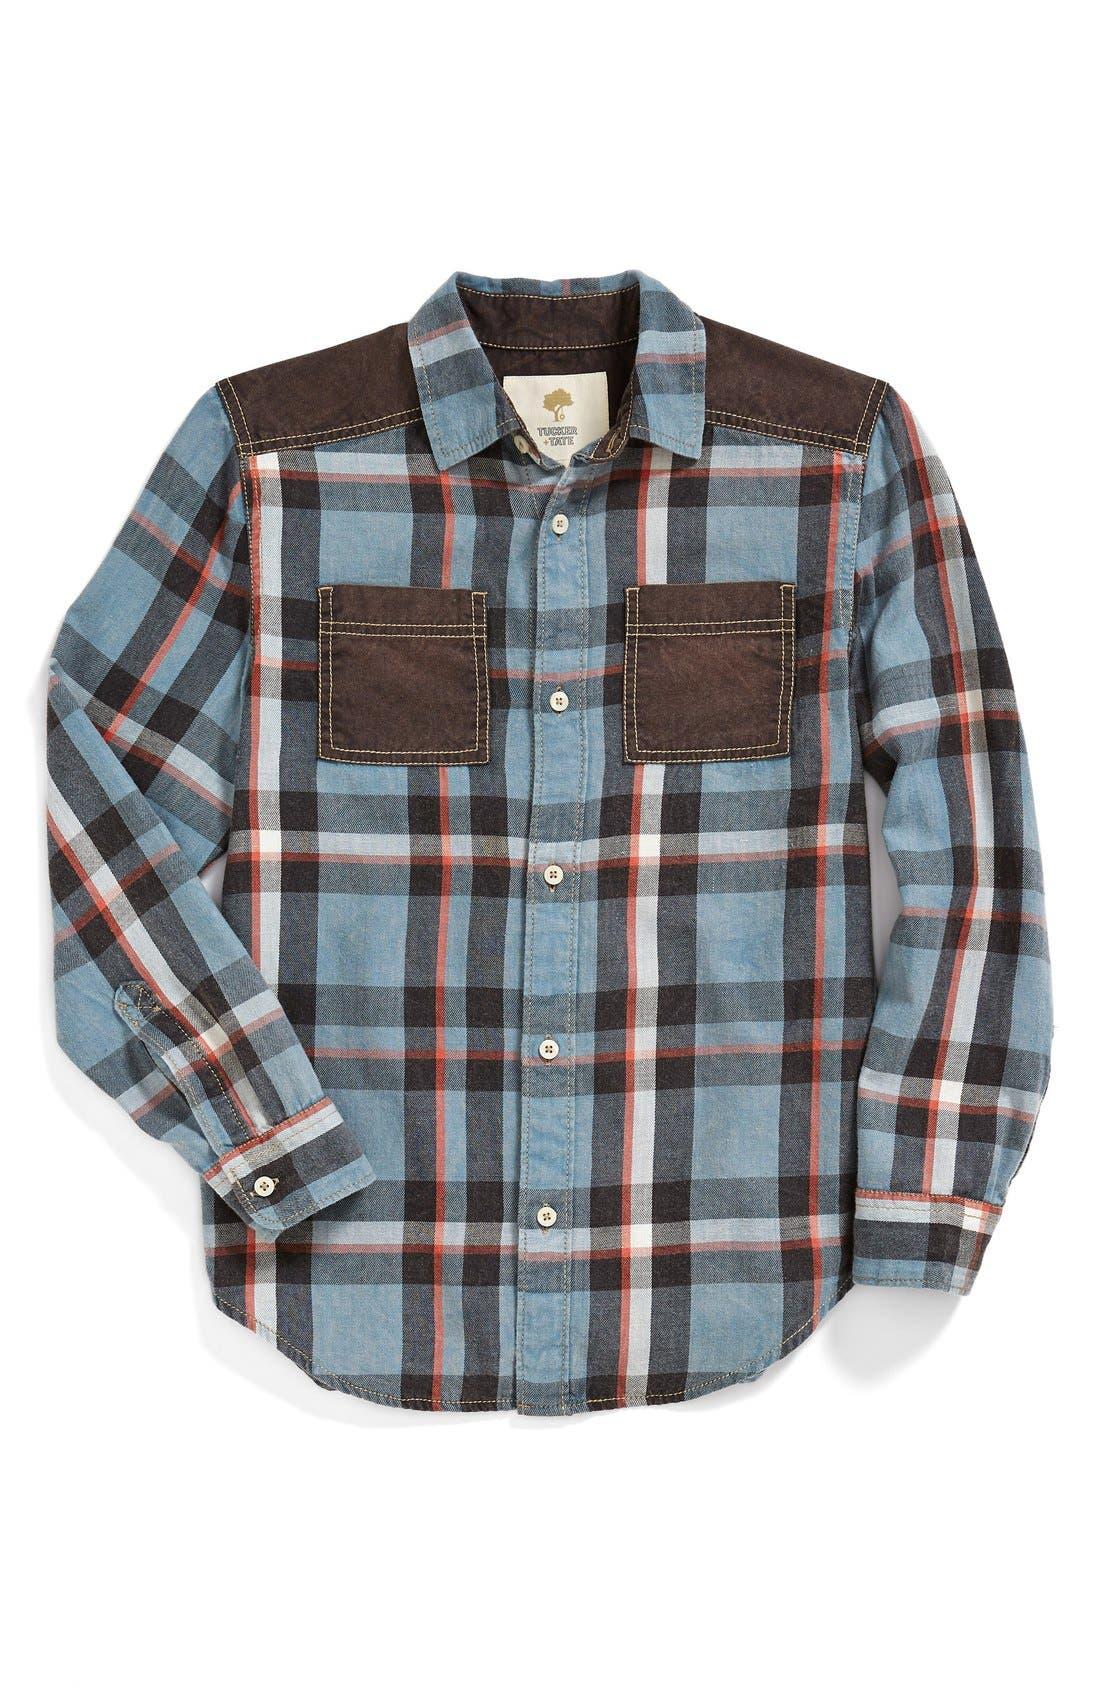 Alternate Image 1 Selected - Tucker + Tate 'Lenny' Contrast Trim Long Sleeve Shirt (Big Boys)